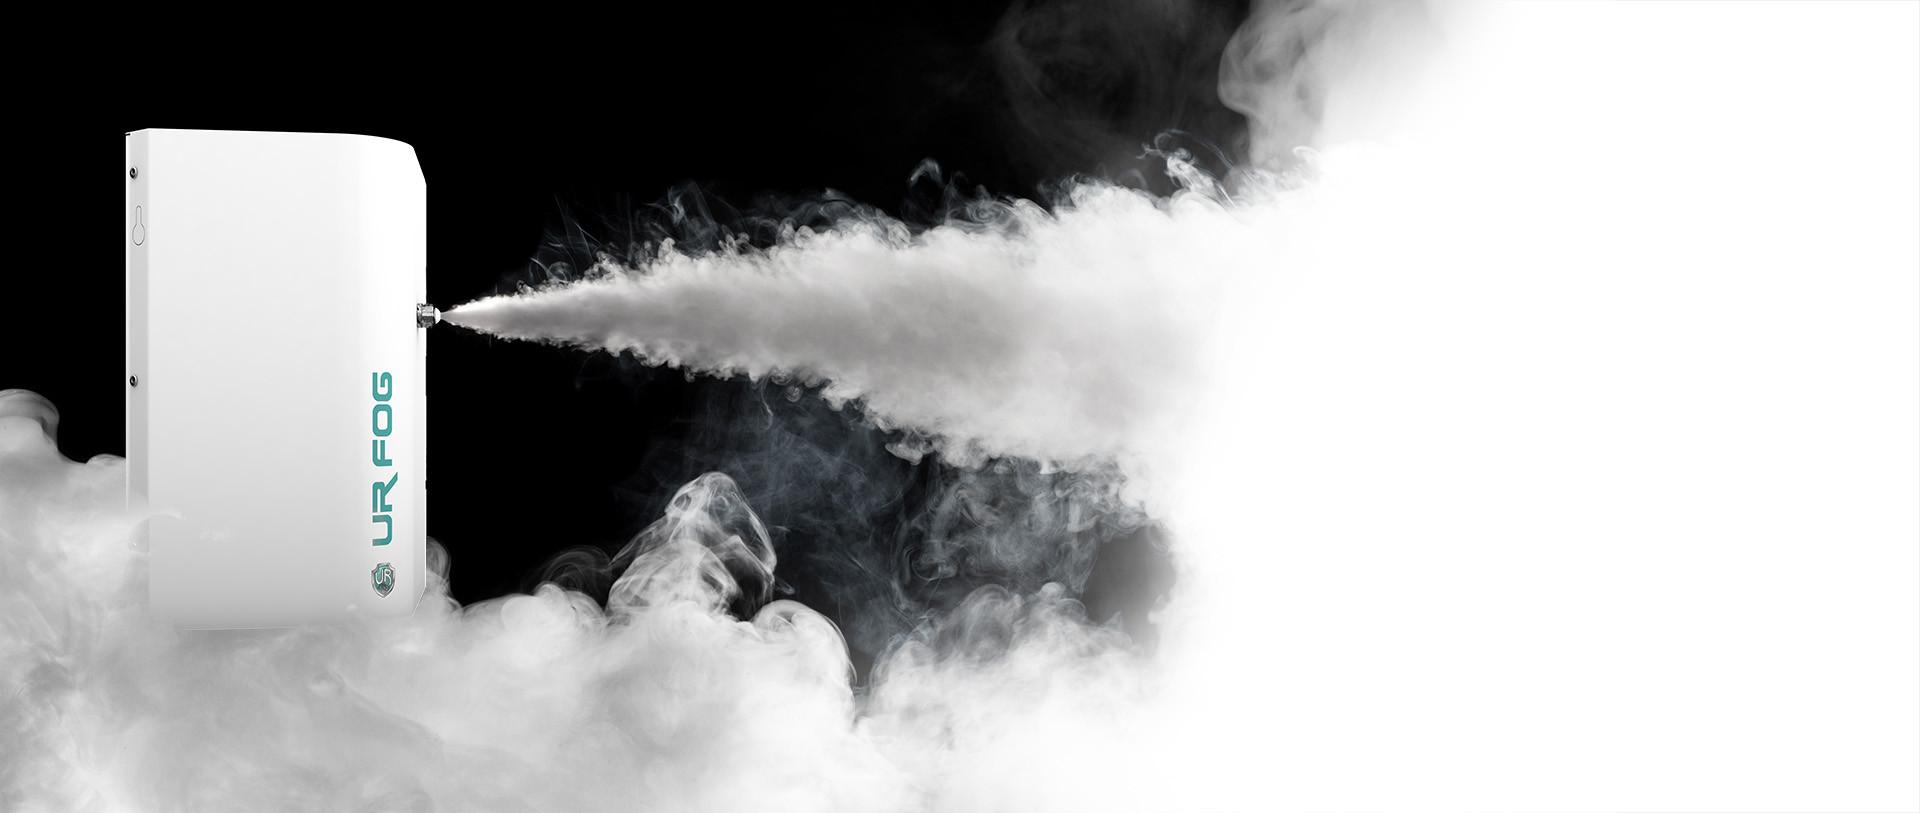 nebbiogeni e fumogeni